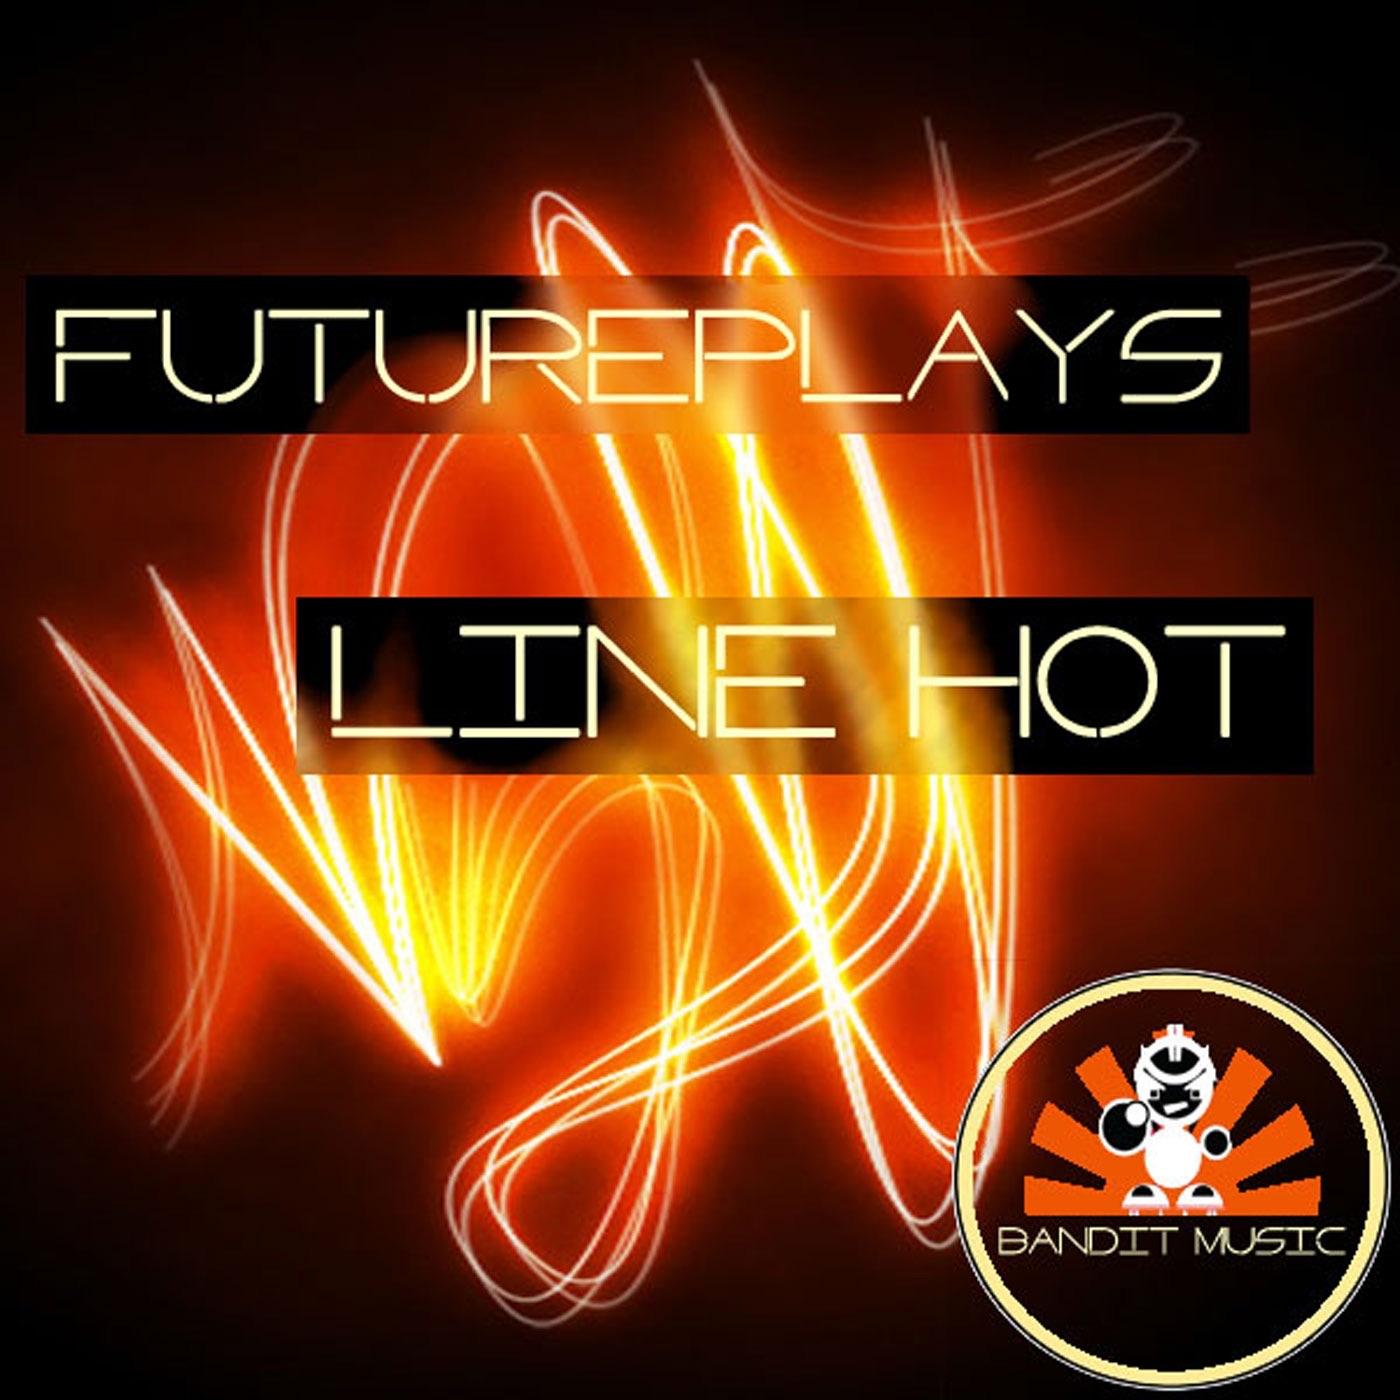 Line Hot